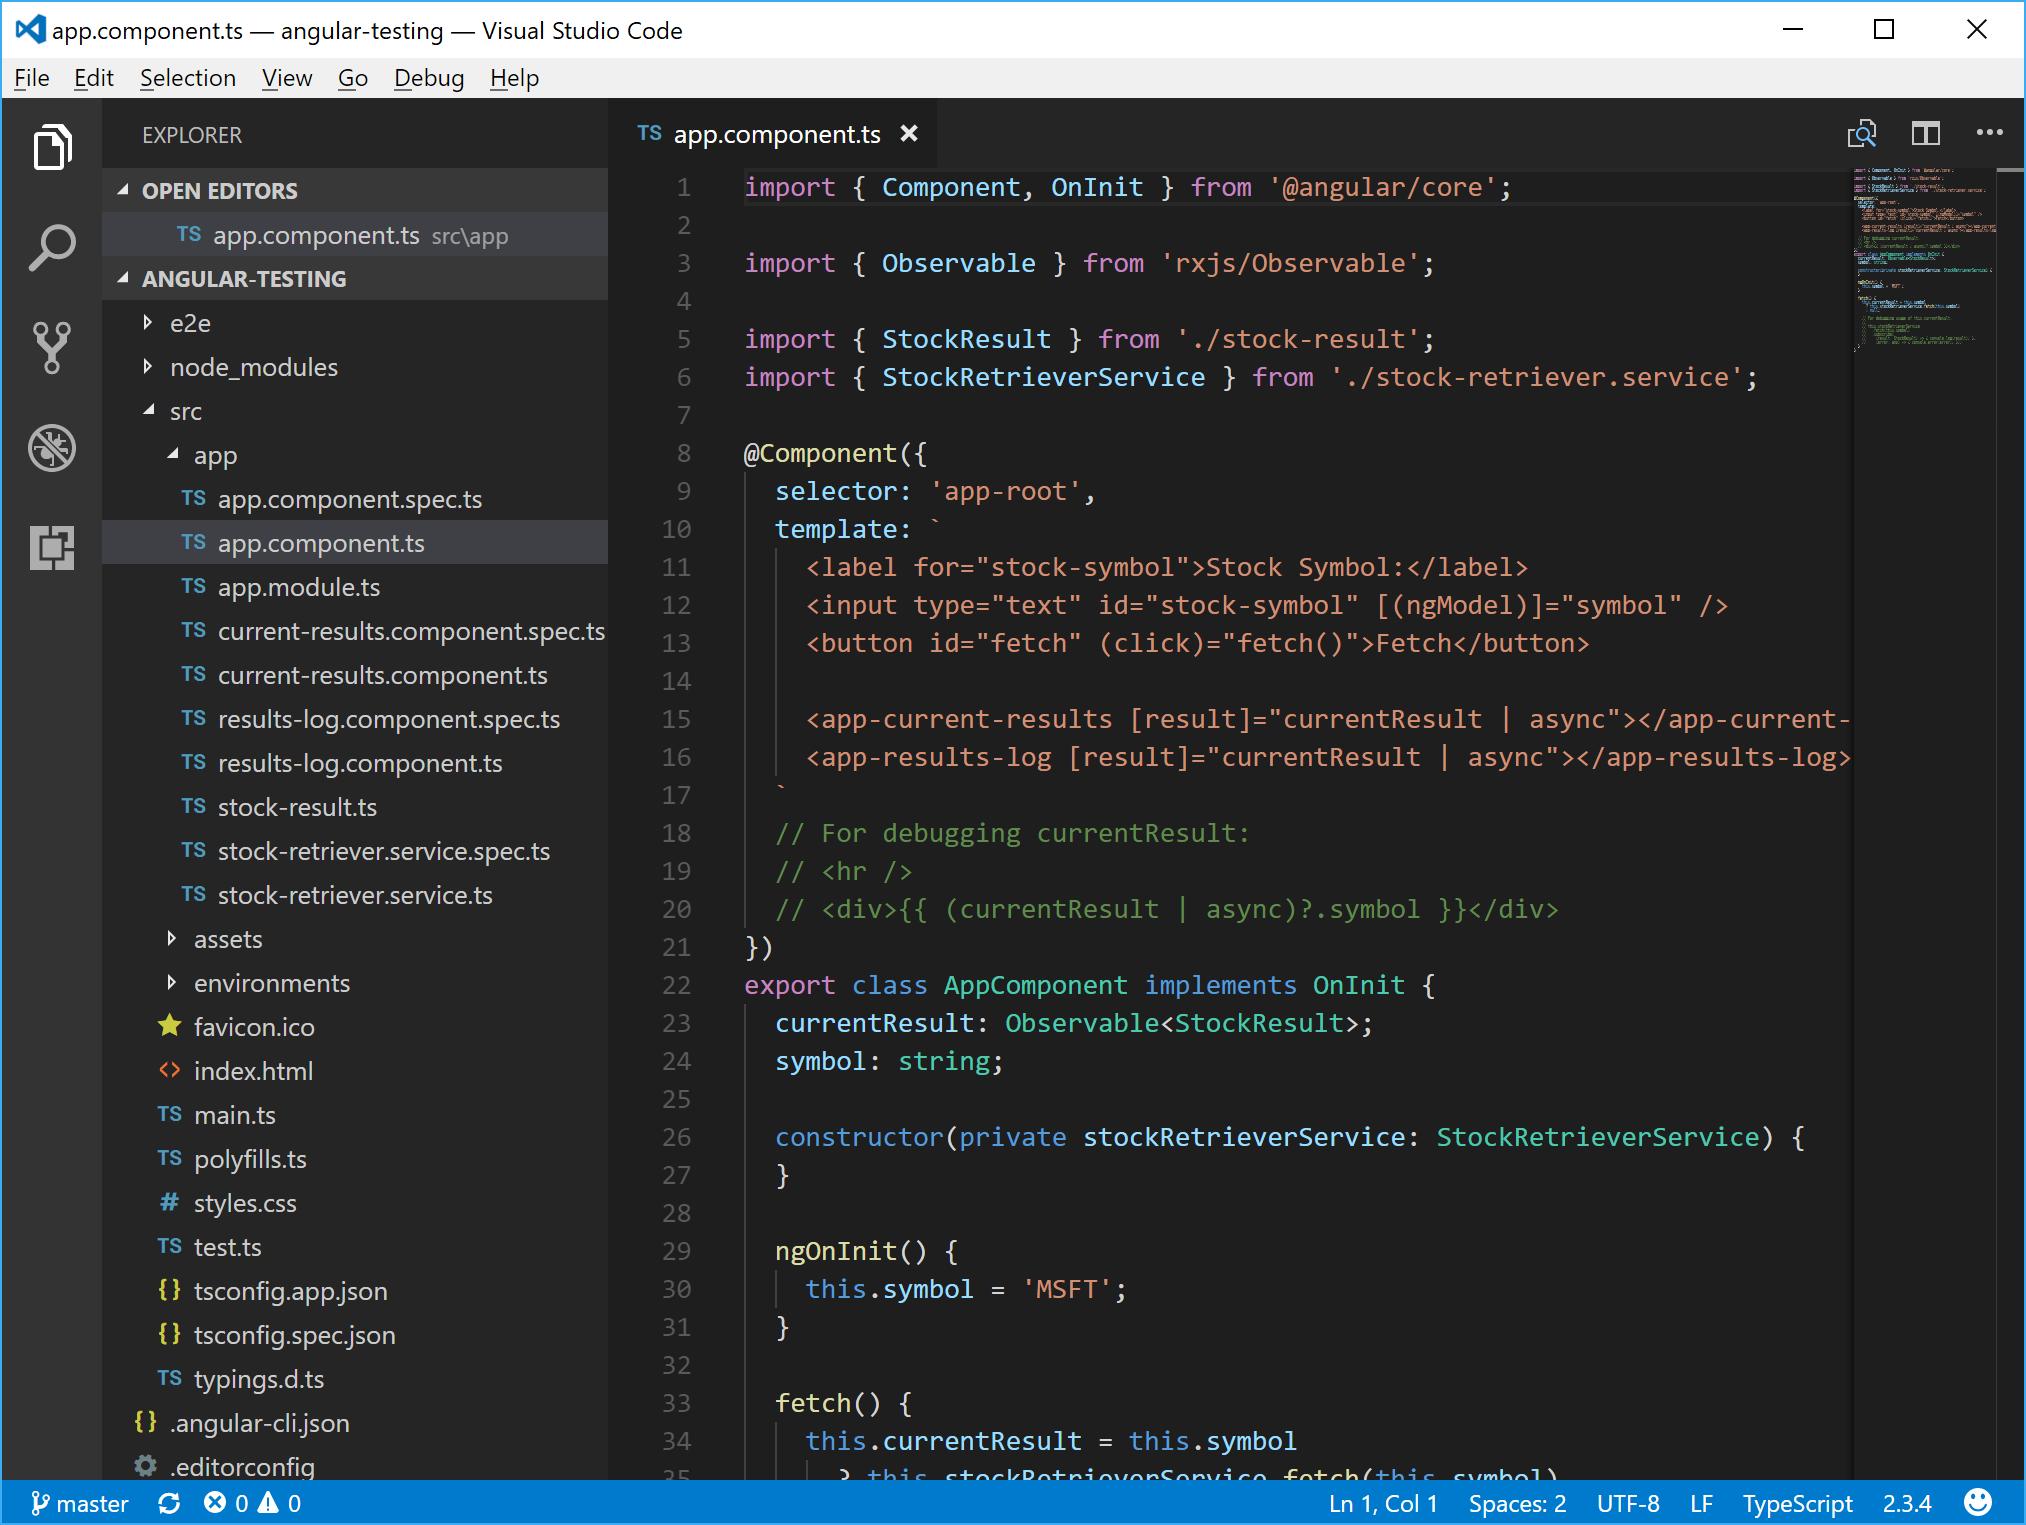 A Minimal UI Visual Studio Code Configuration